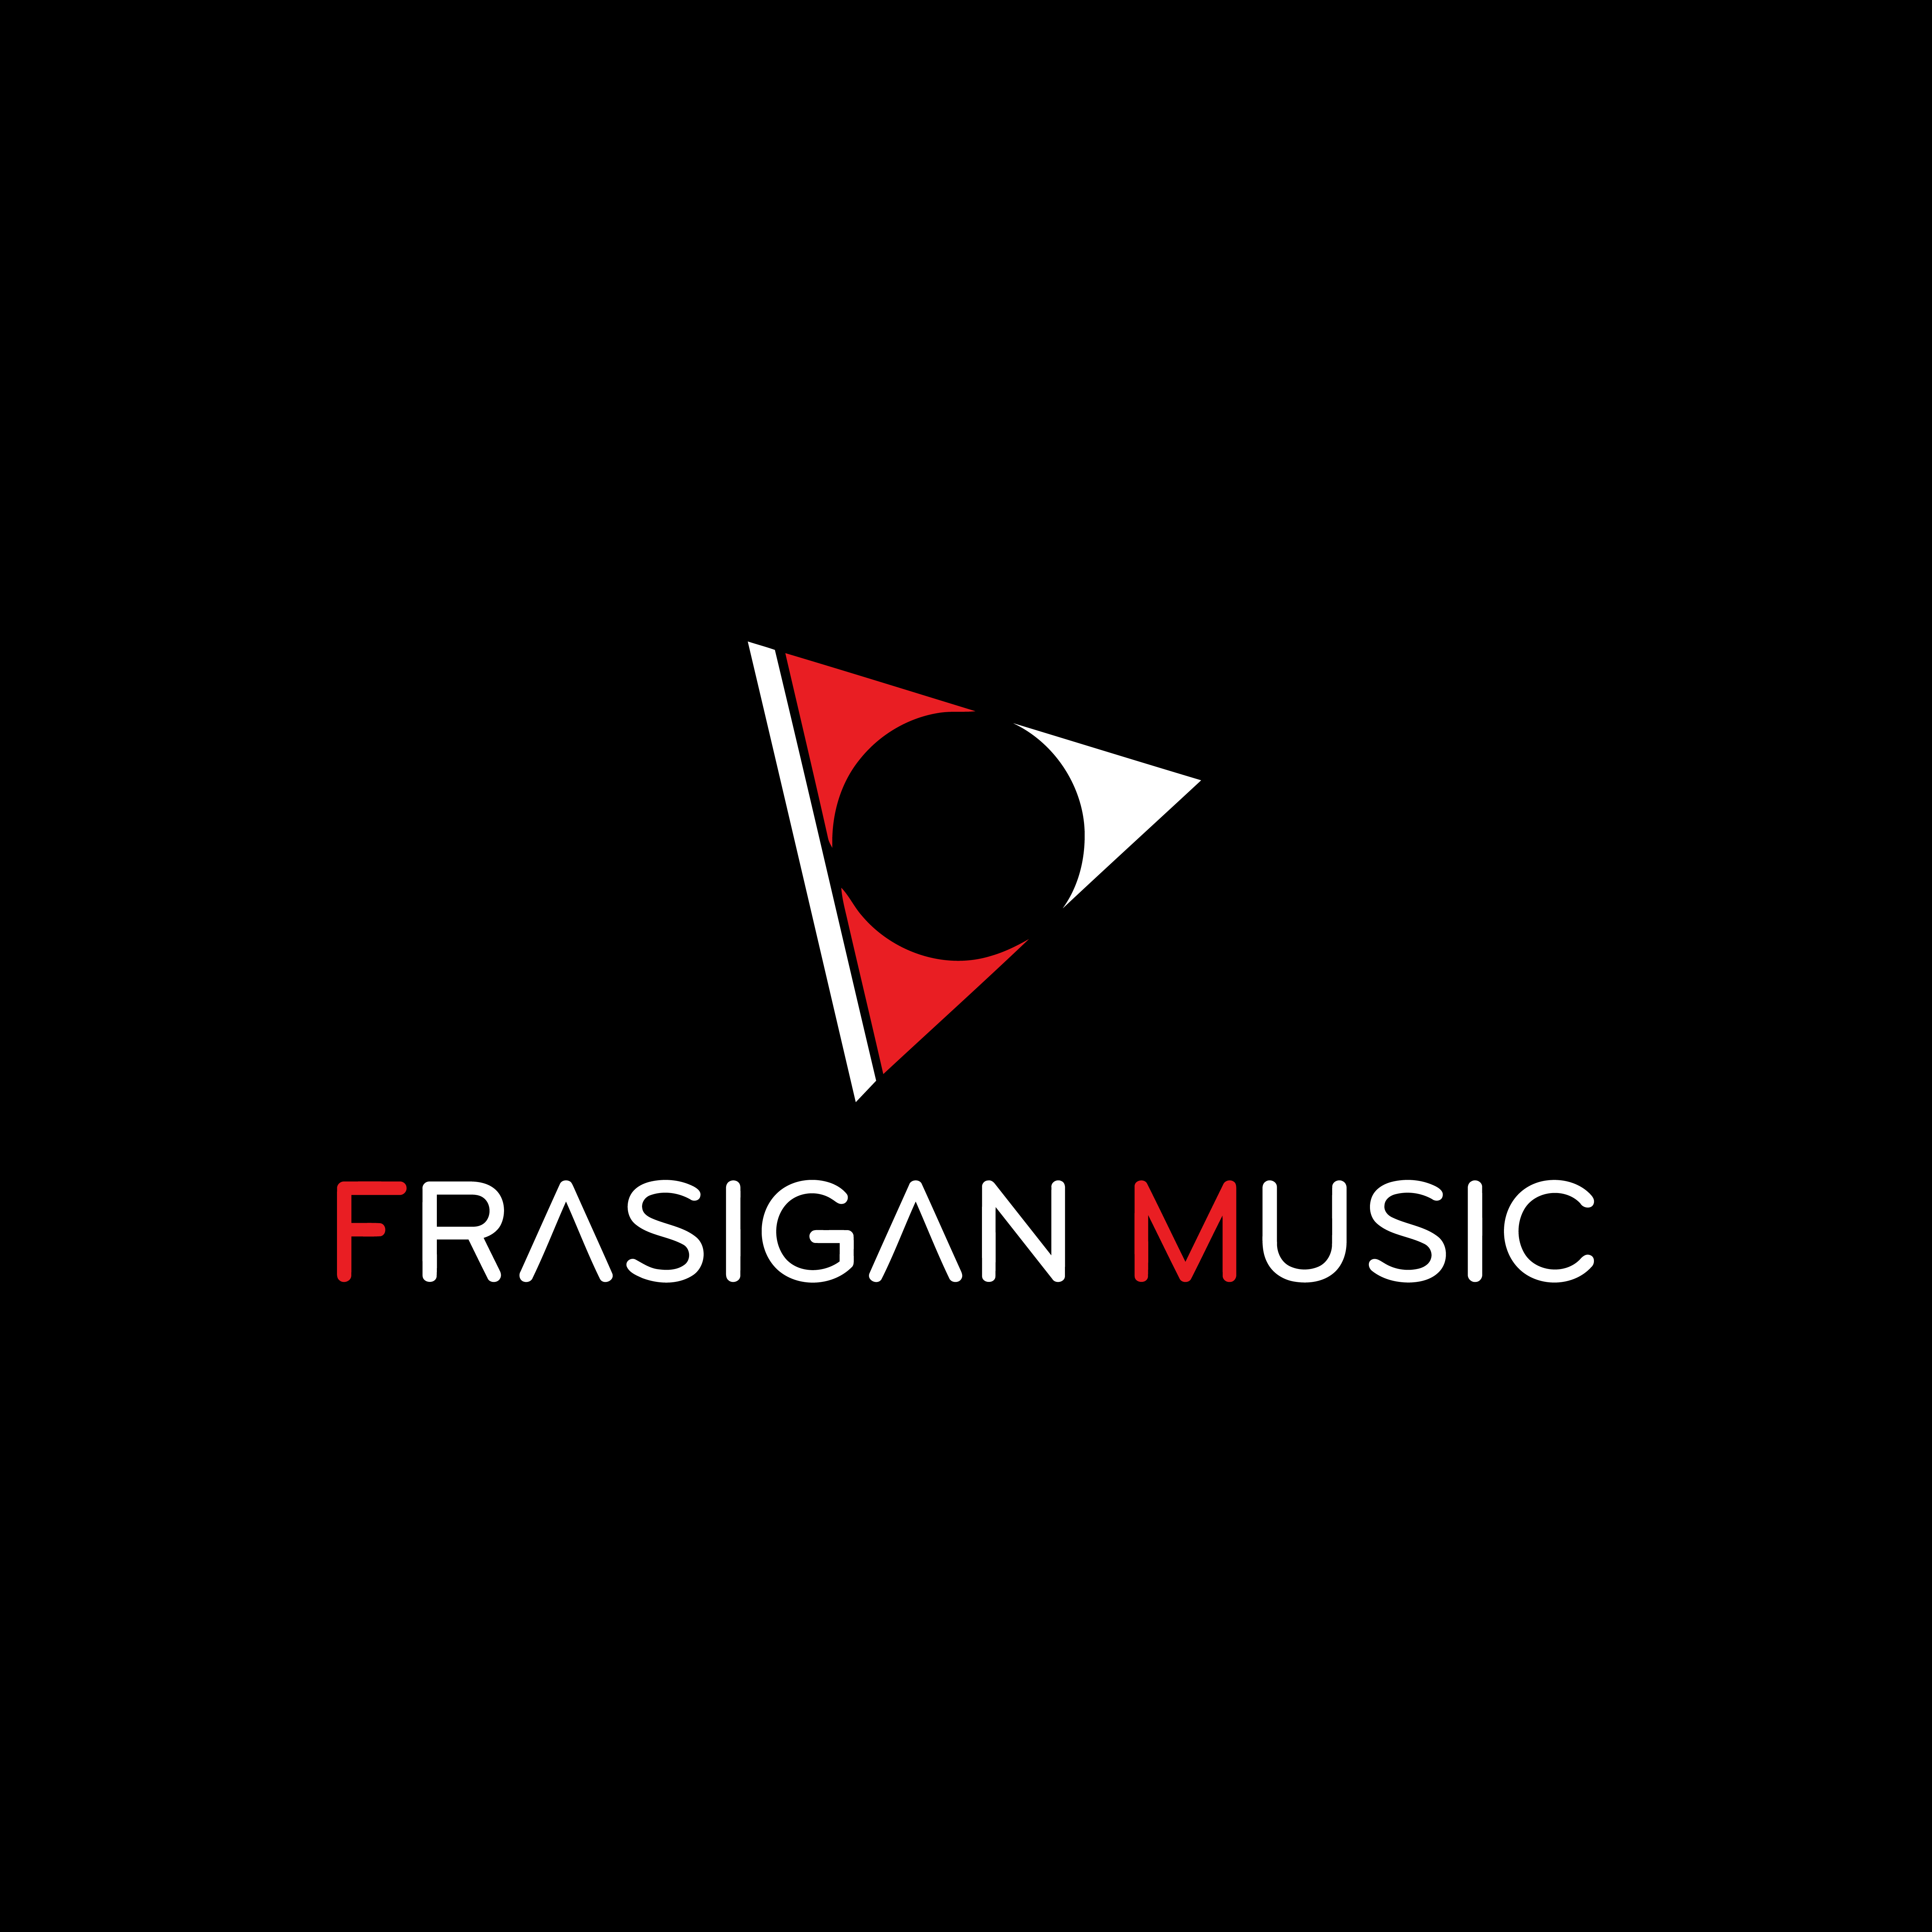 Frasigan Music